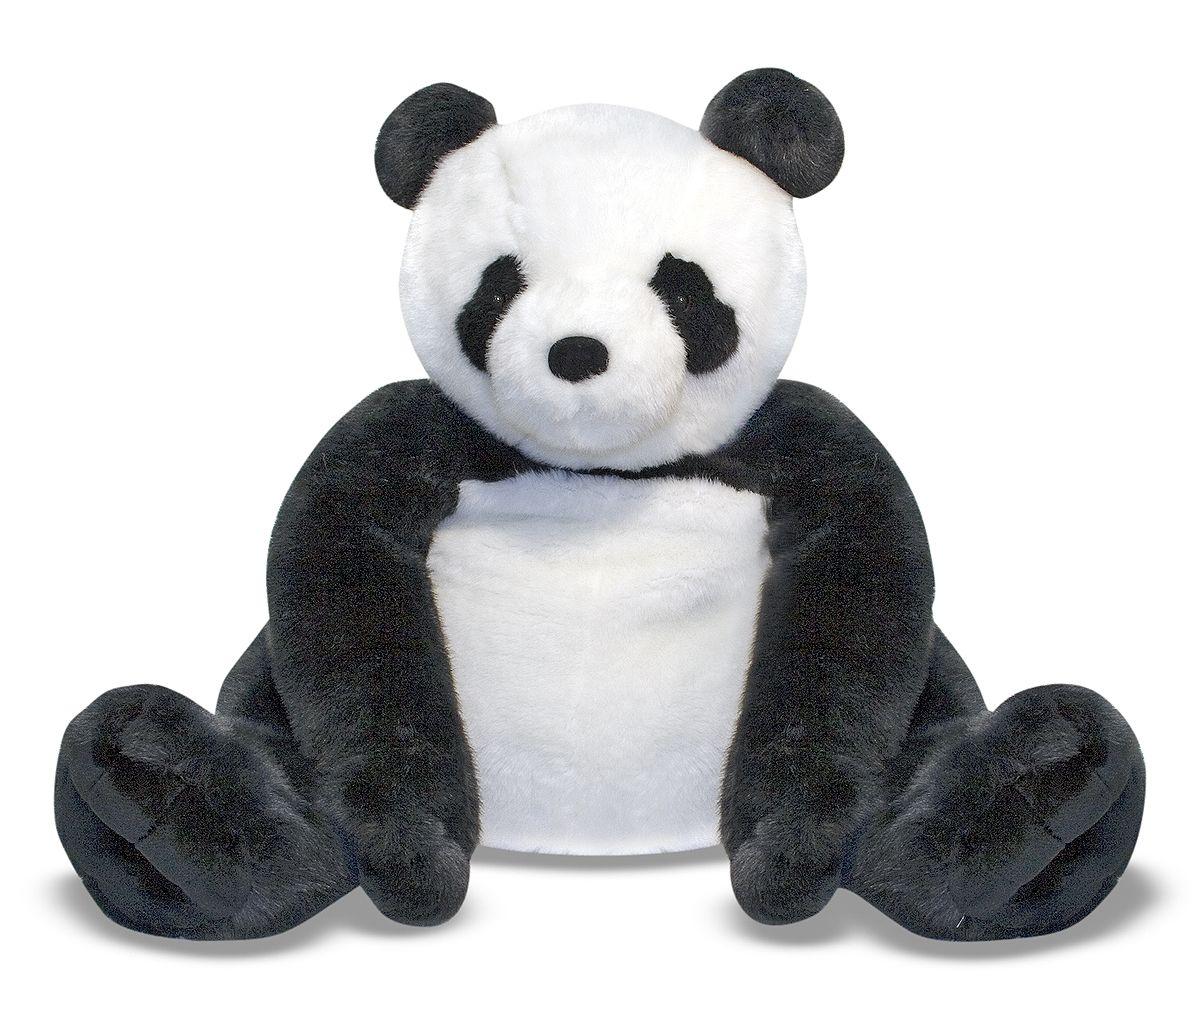 PANDA PLUSH